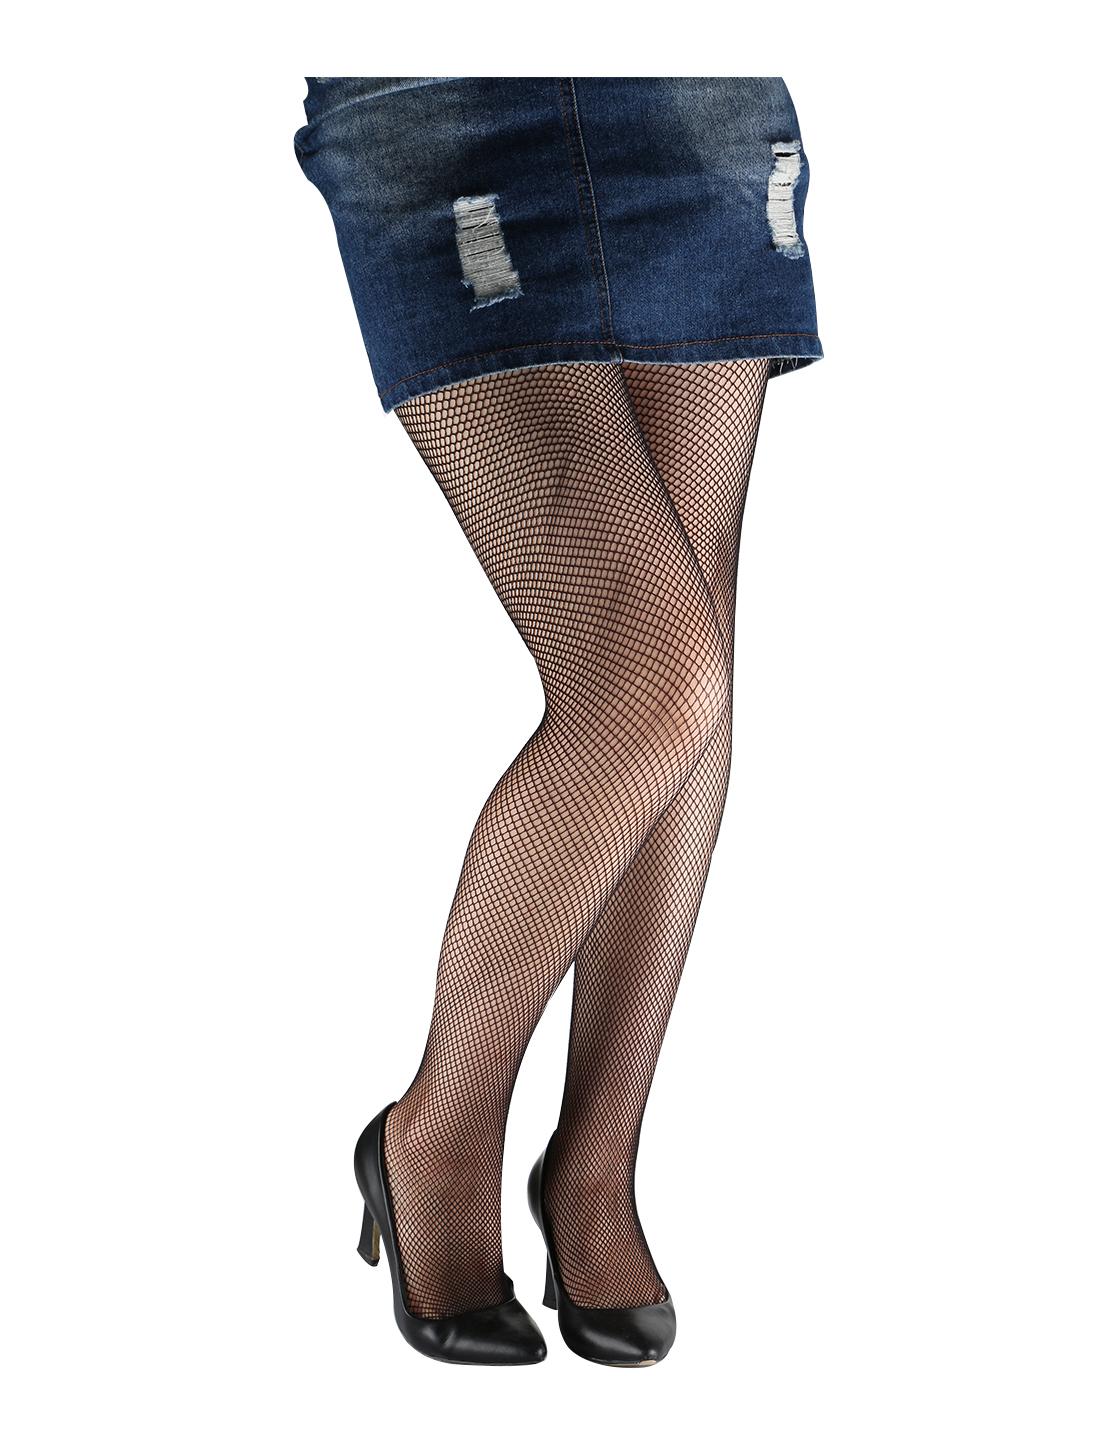 Women 2 Pack Trendy Strechy Fishnet Stockings Pantyhose Small Net Black